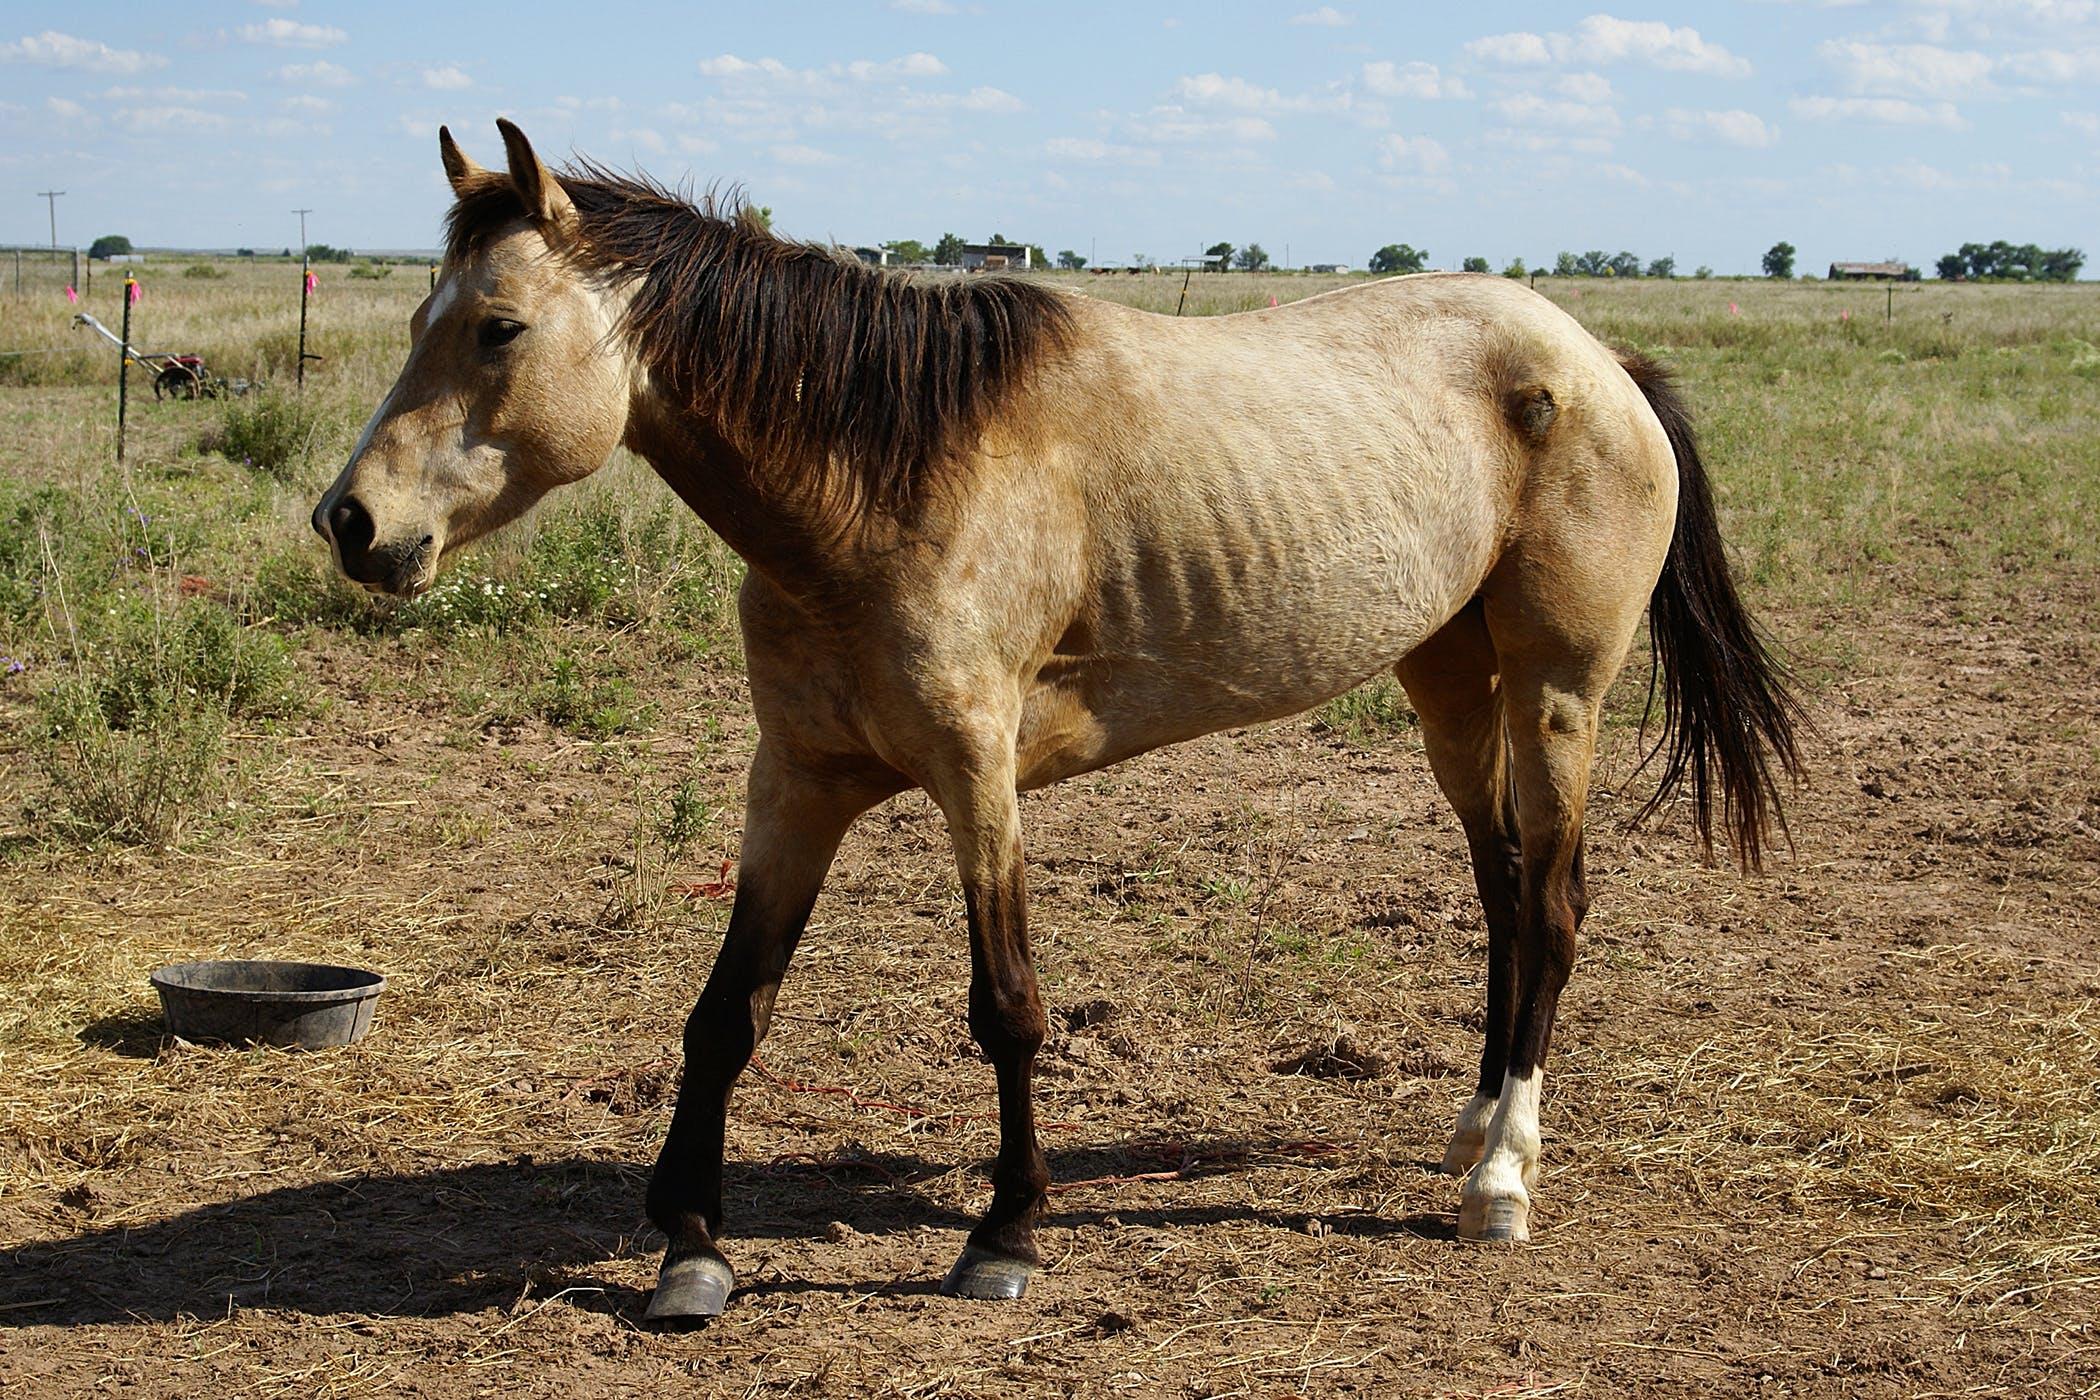 Aspiration Pneumonia in Horses - Symptoms, Causes, Diagnosis